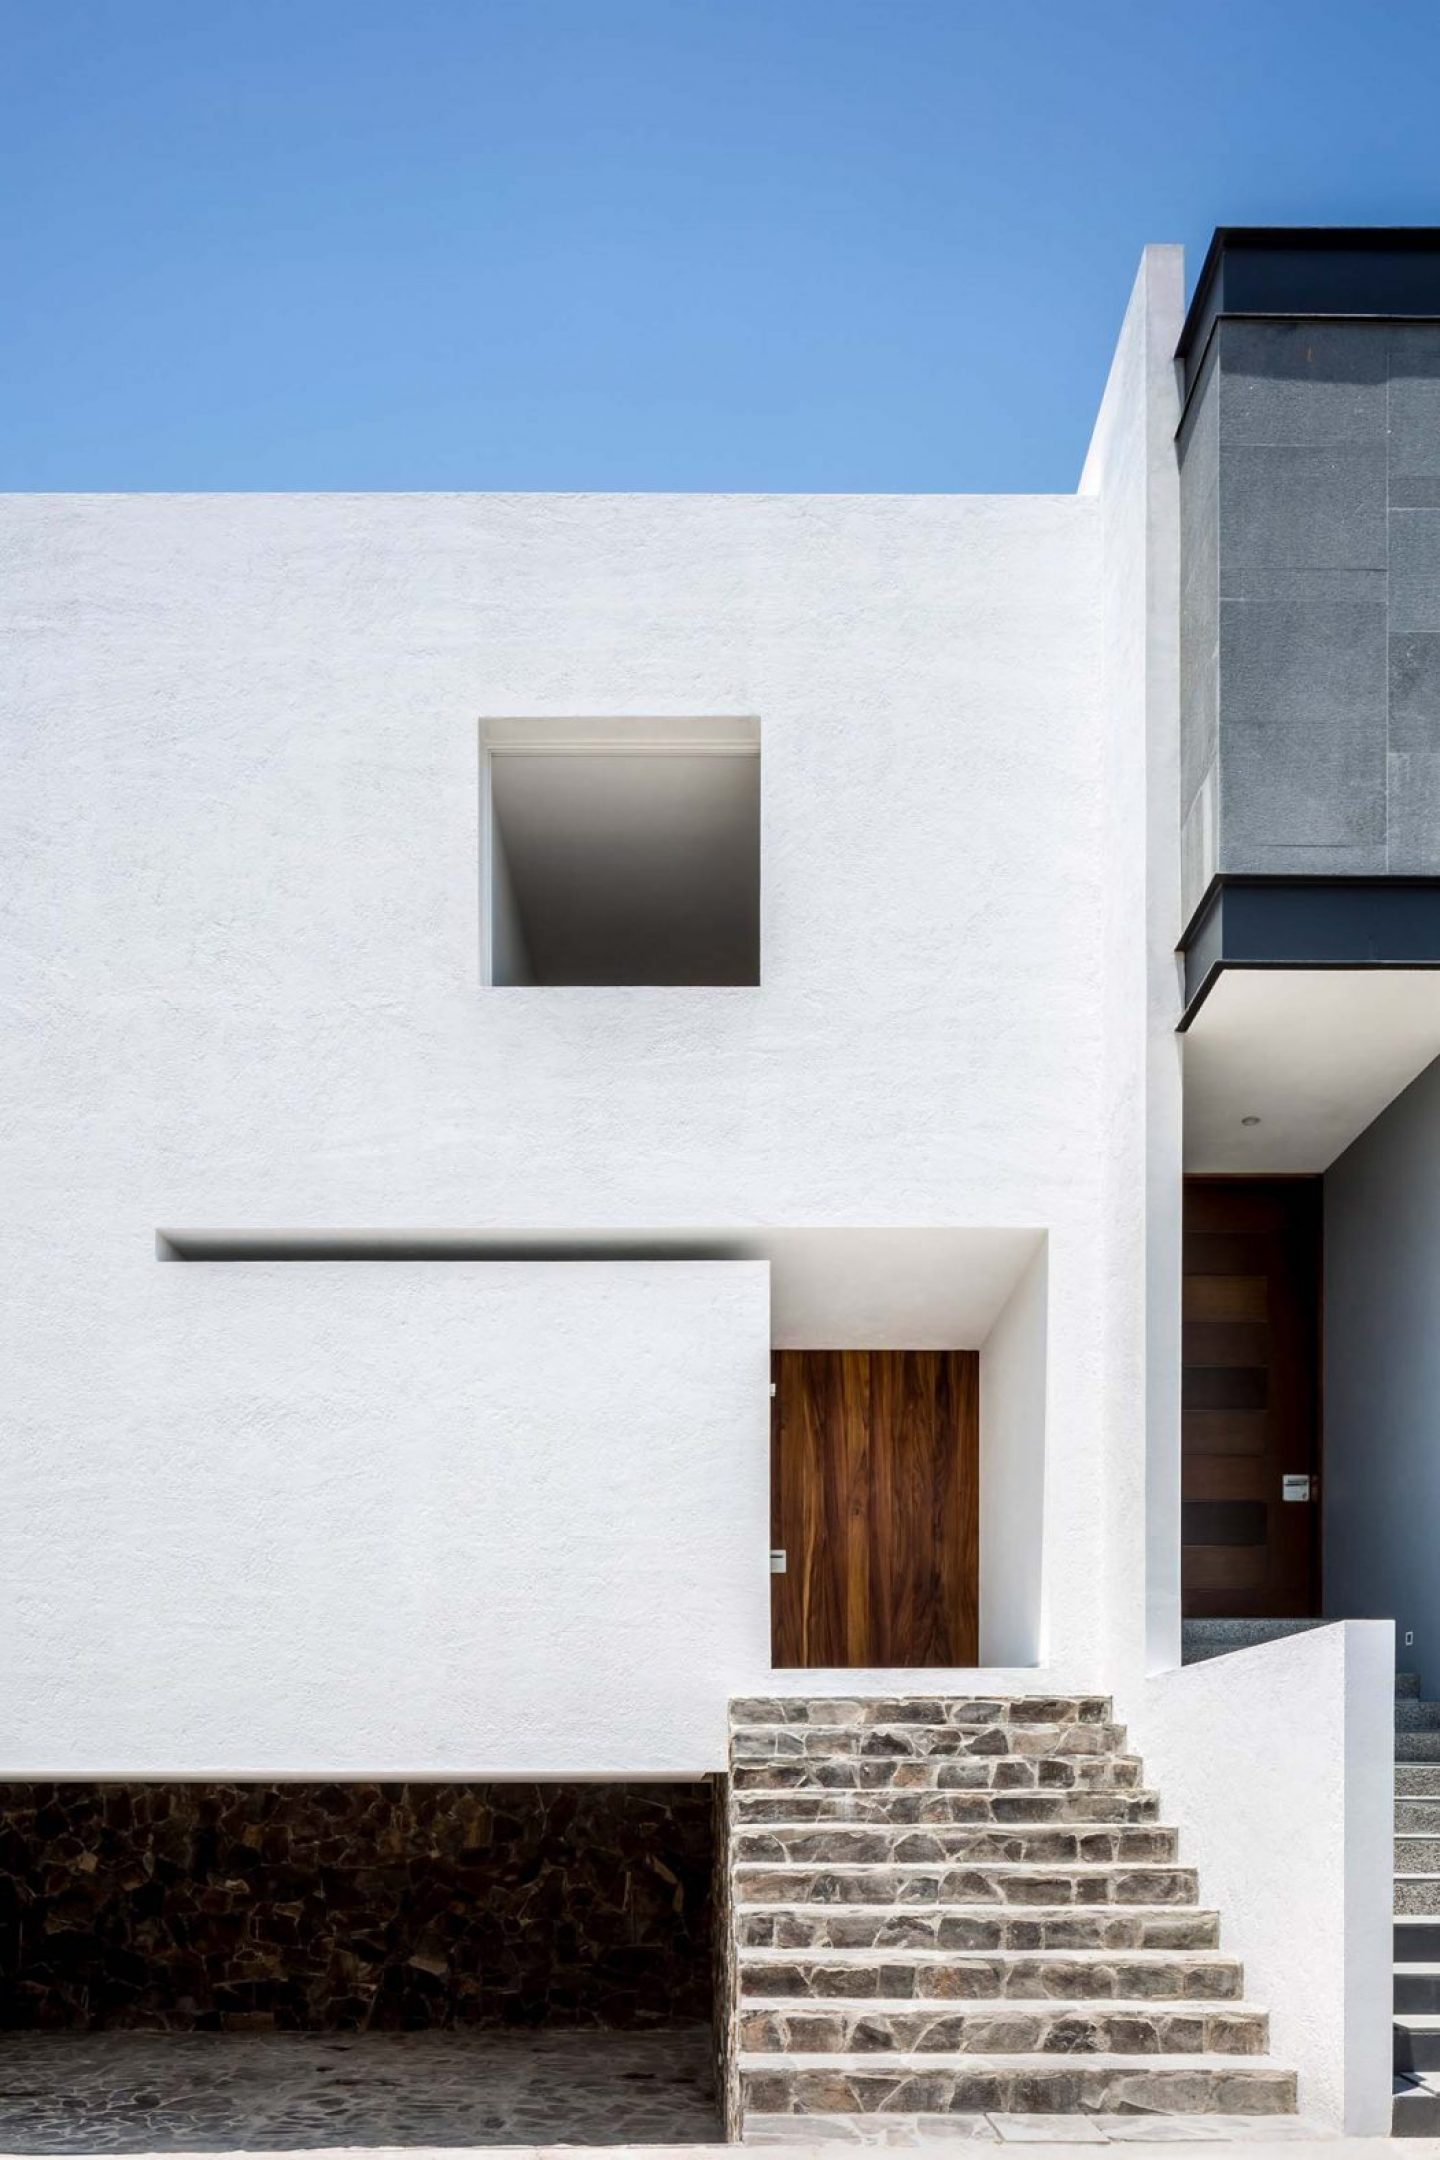 iGNANT_Architecture_Cave_House_Abraham_Cota_Paredes27